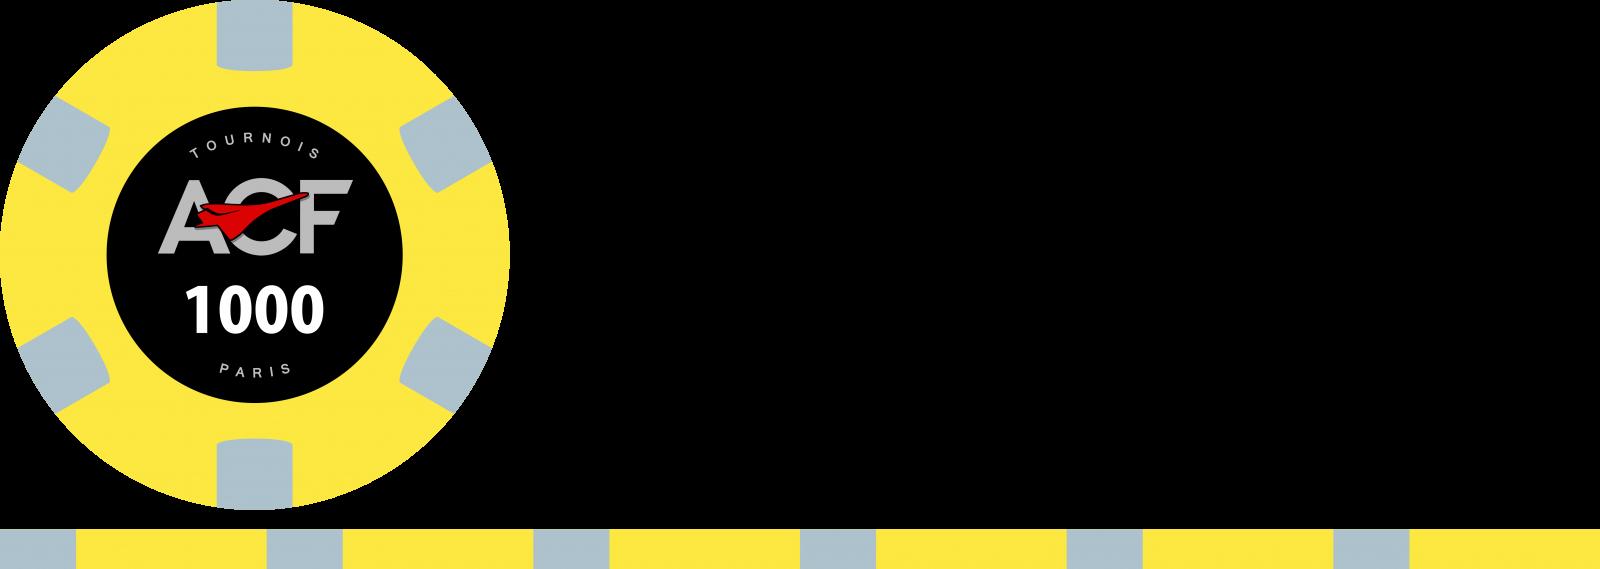 PolyClay_ACF_1000_v2b.thumb.png.c5d9c22a81365c695ef968650dd698a4.png